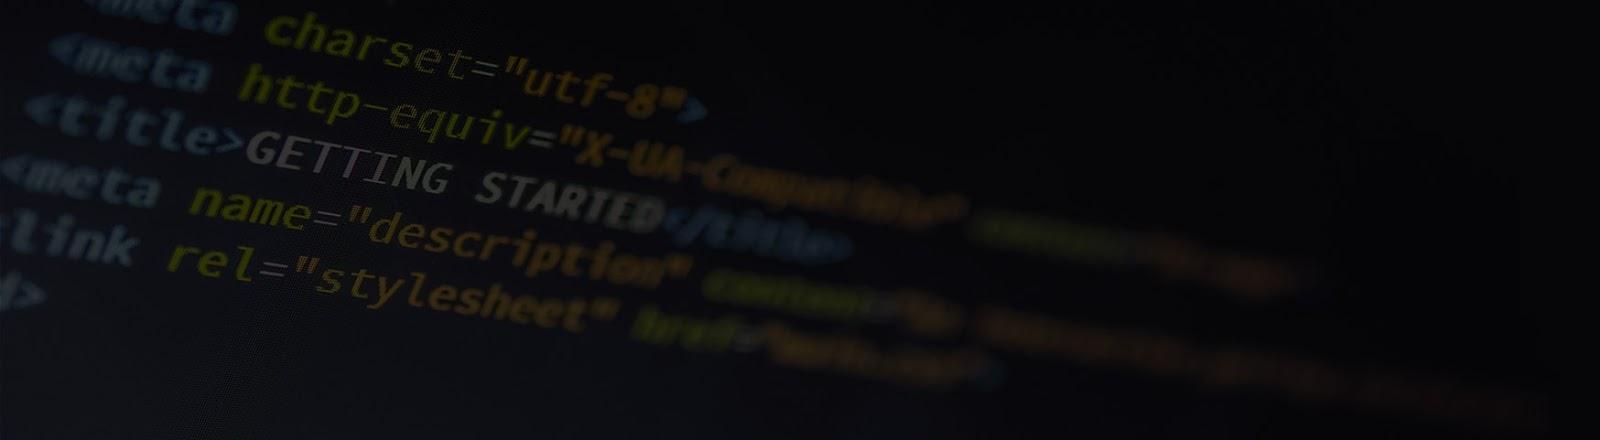 HTML Responsive Web Design